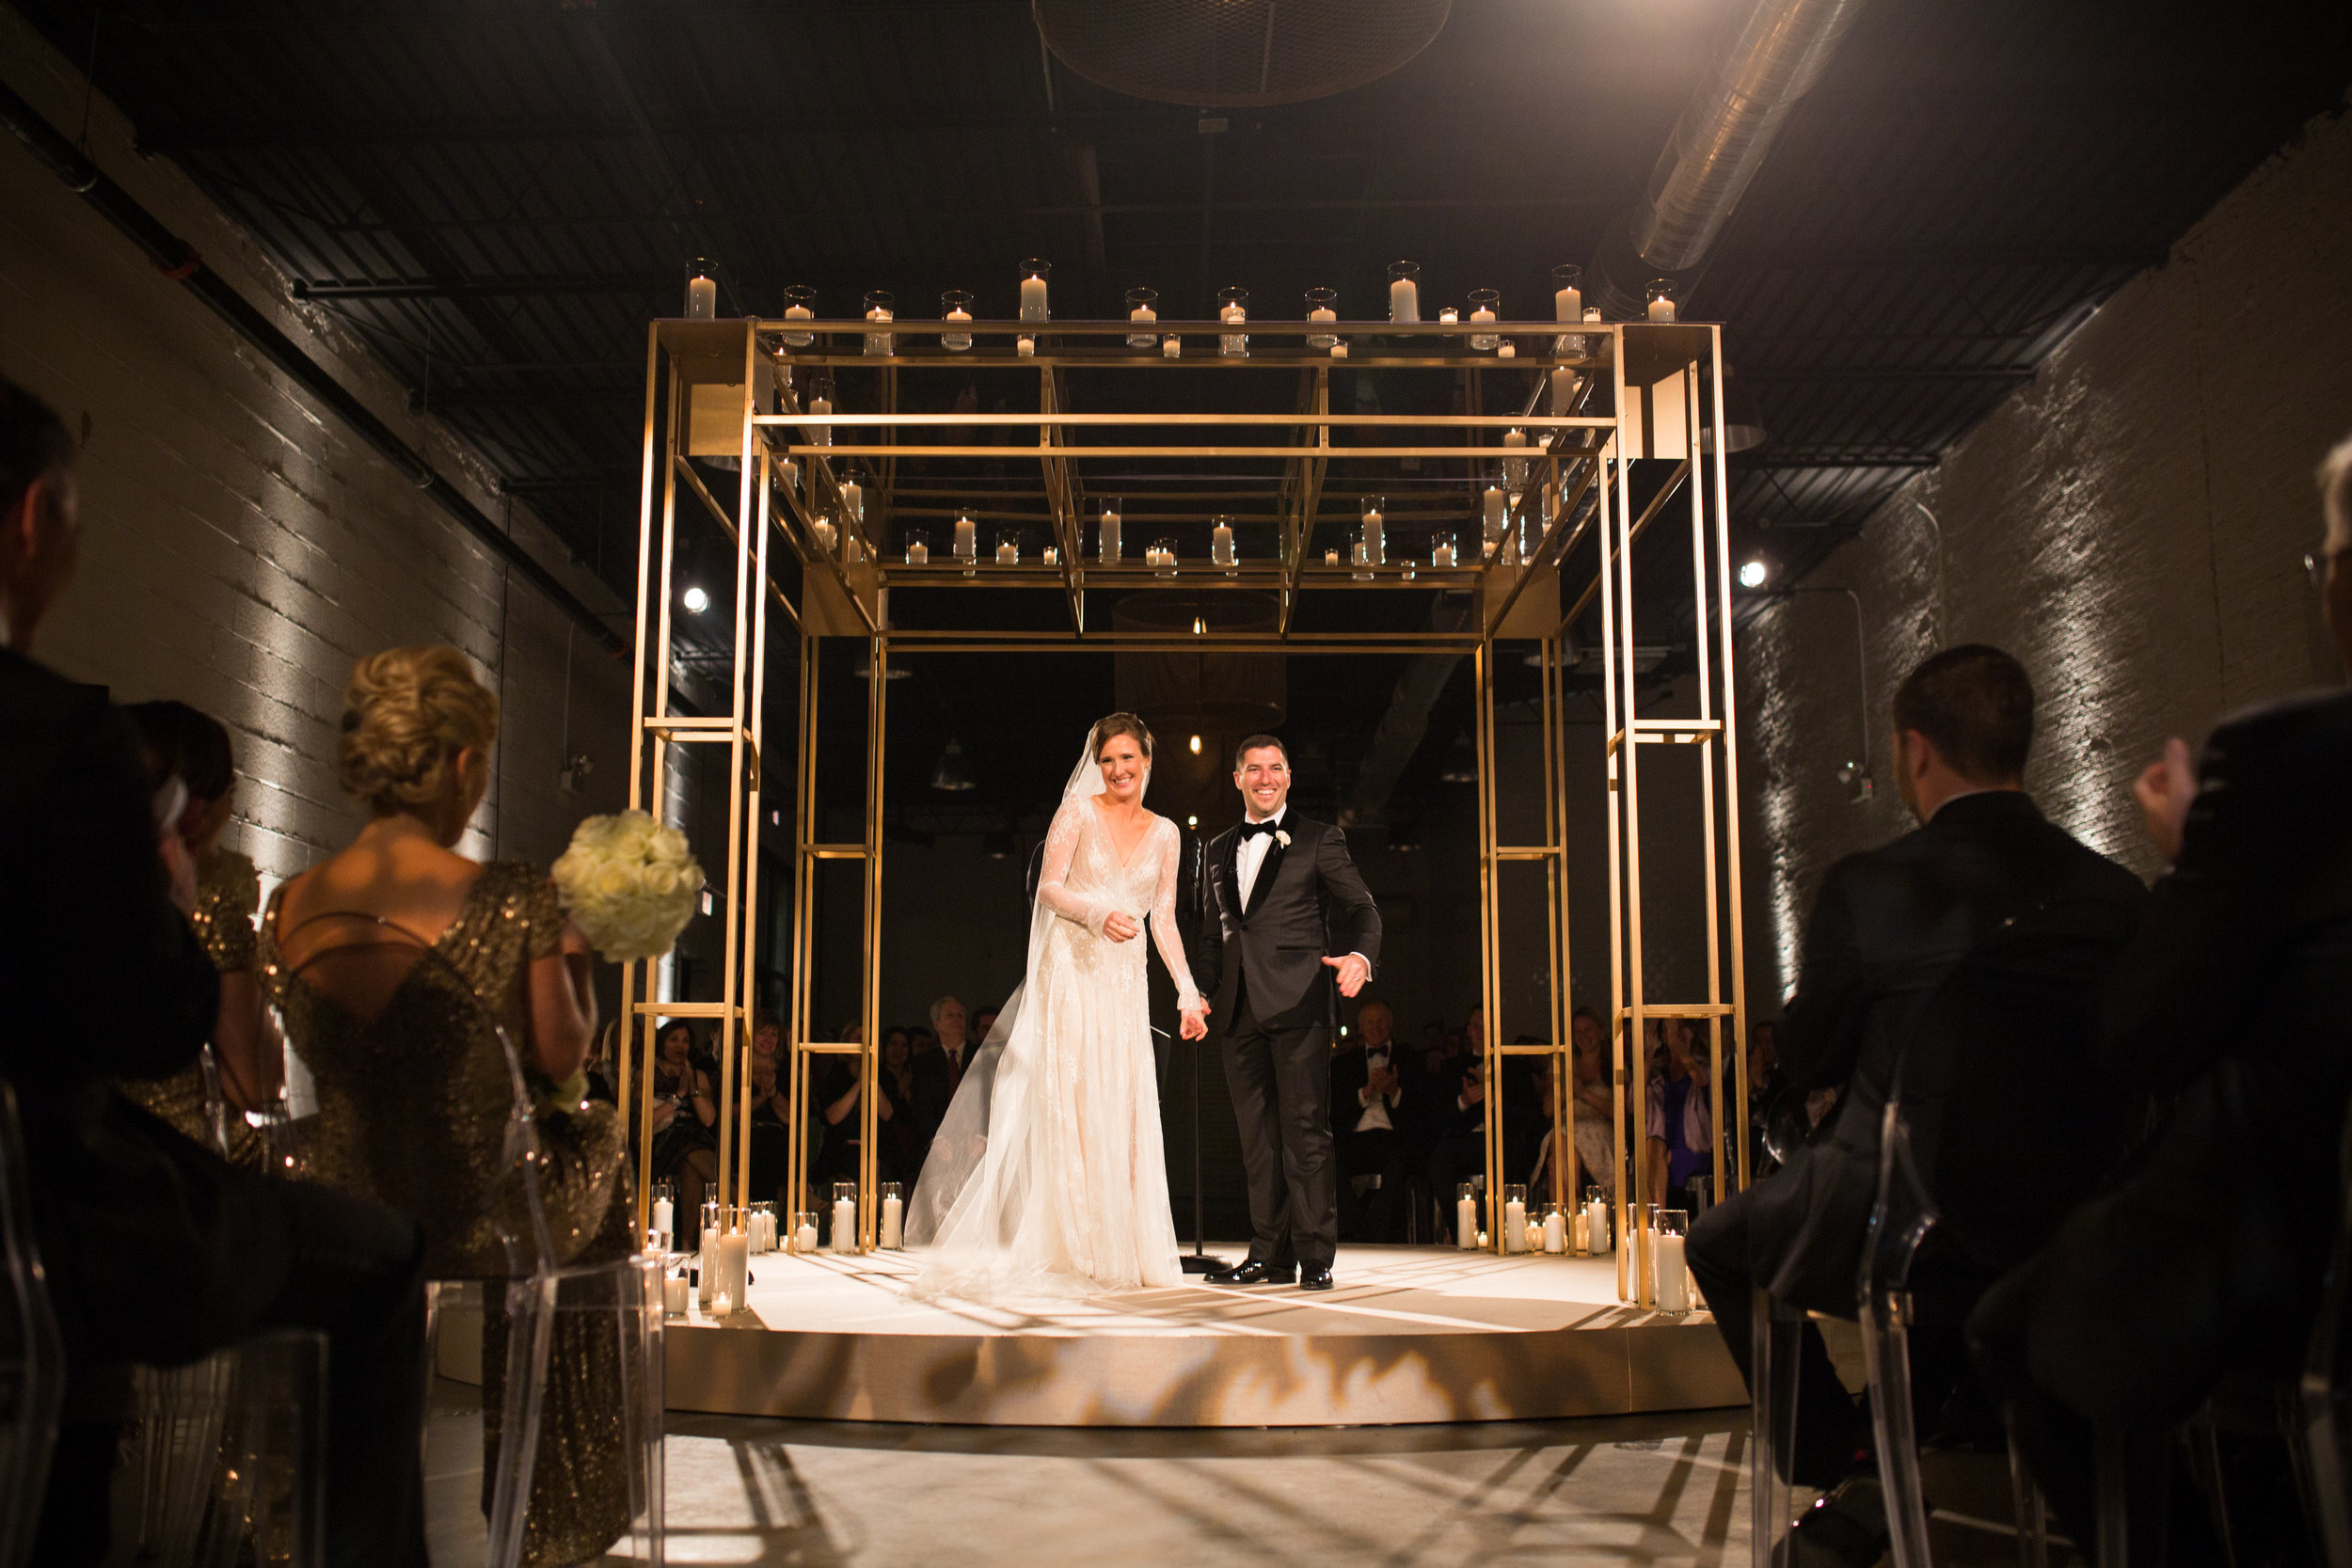 Wedding Ceremony at Revel fulton market